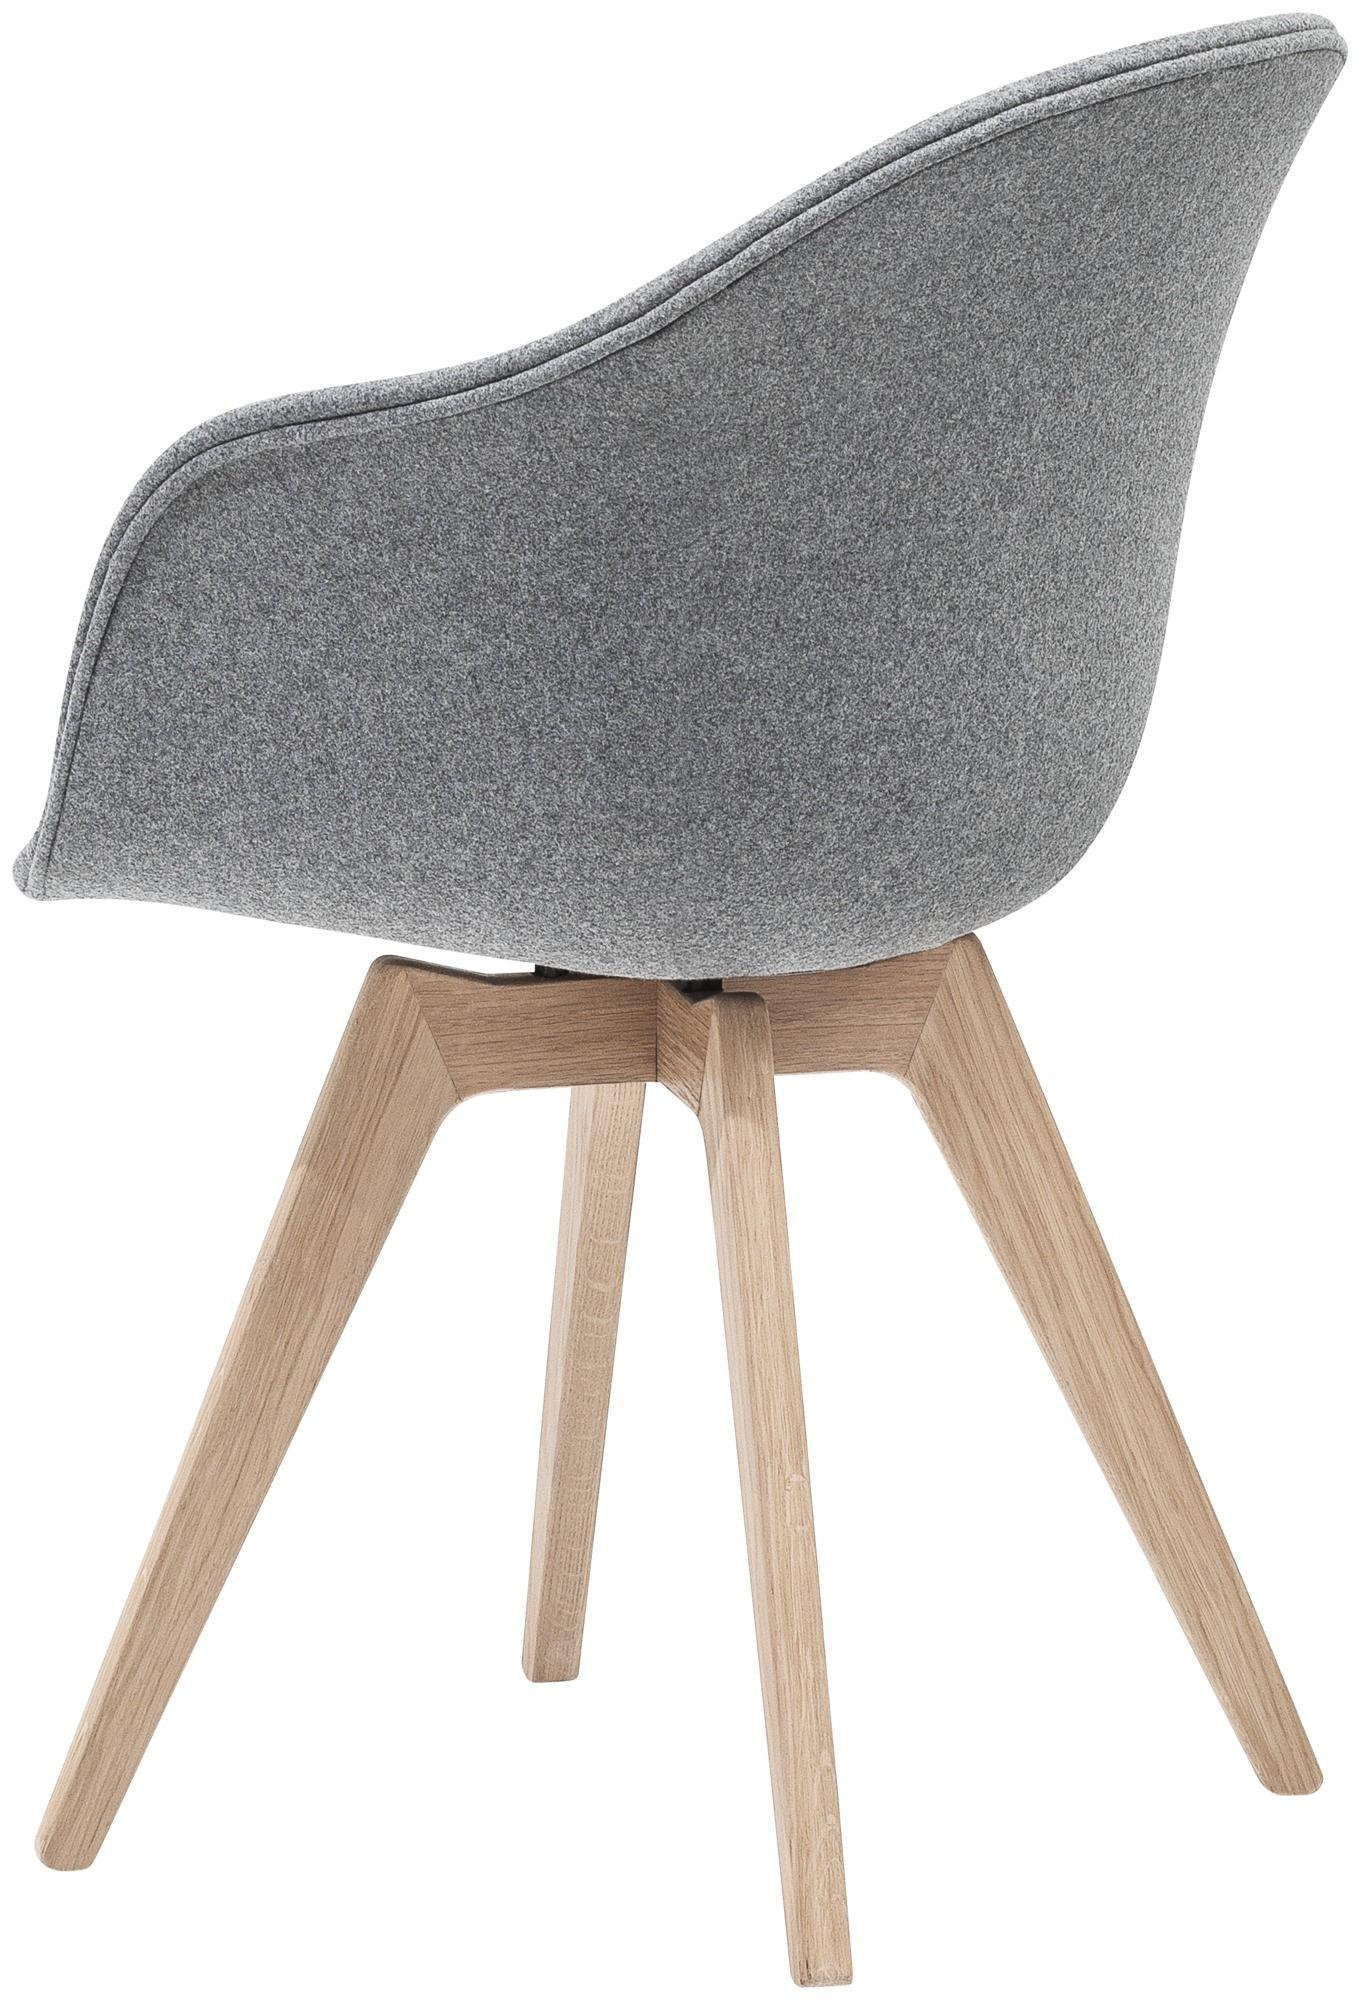 Moderne Designer Esszimmerstuhle Online Kaufen Boconcept Bc